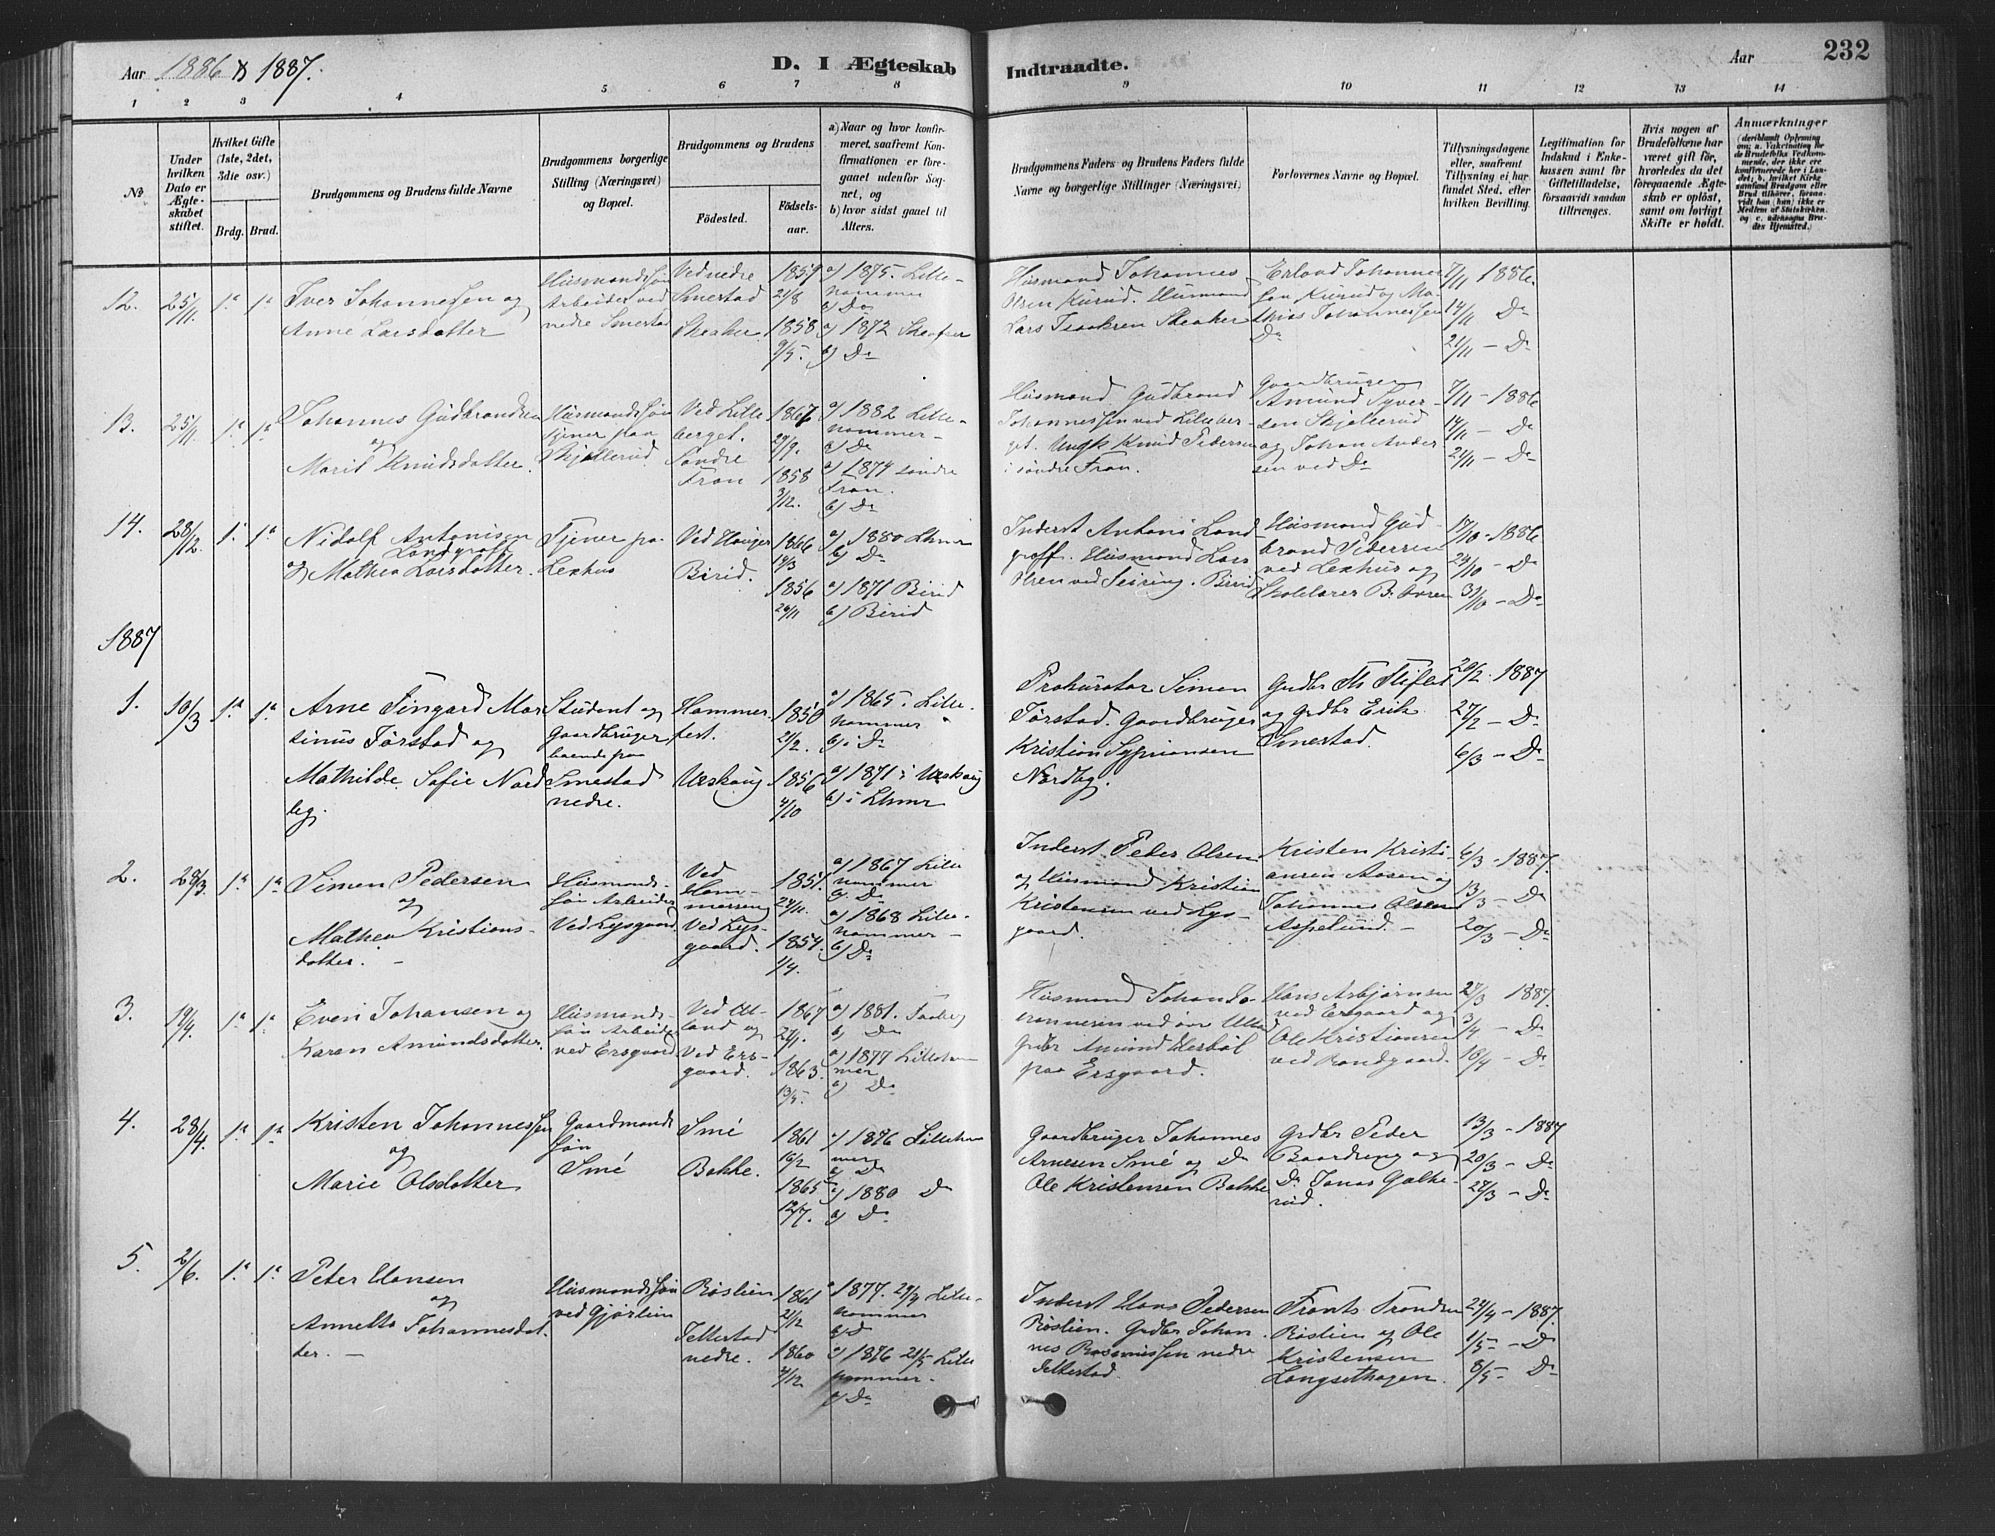 SAH, Fåberg prestekontor, Ministerialbok nr. 9, 1879-1898, s. 232